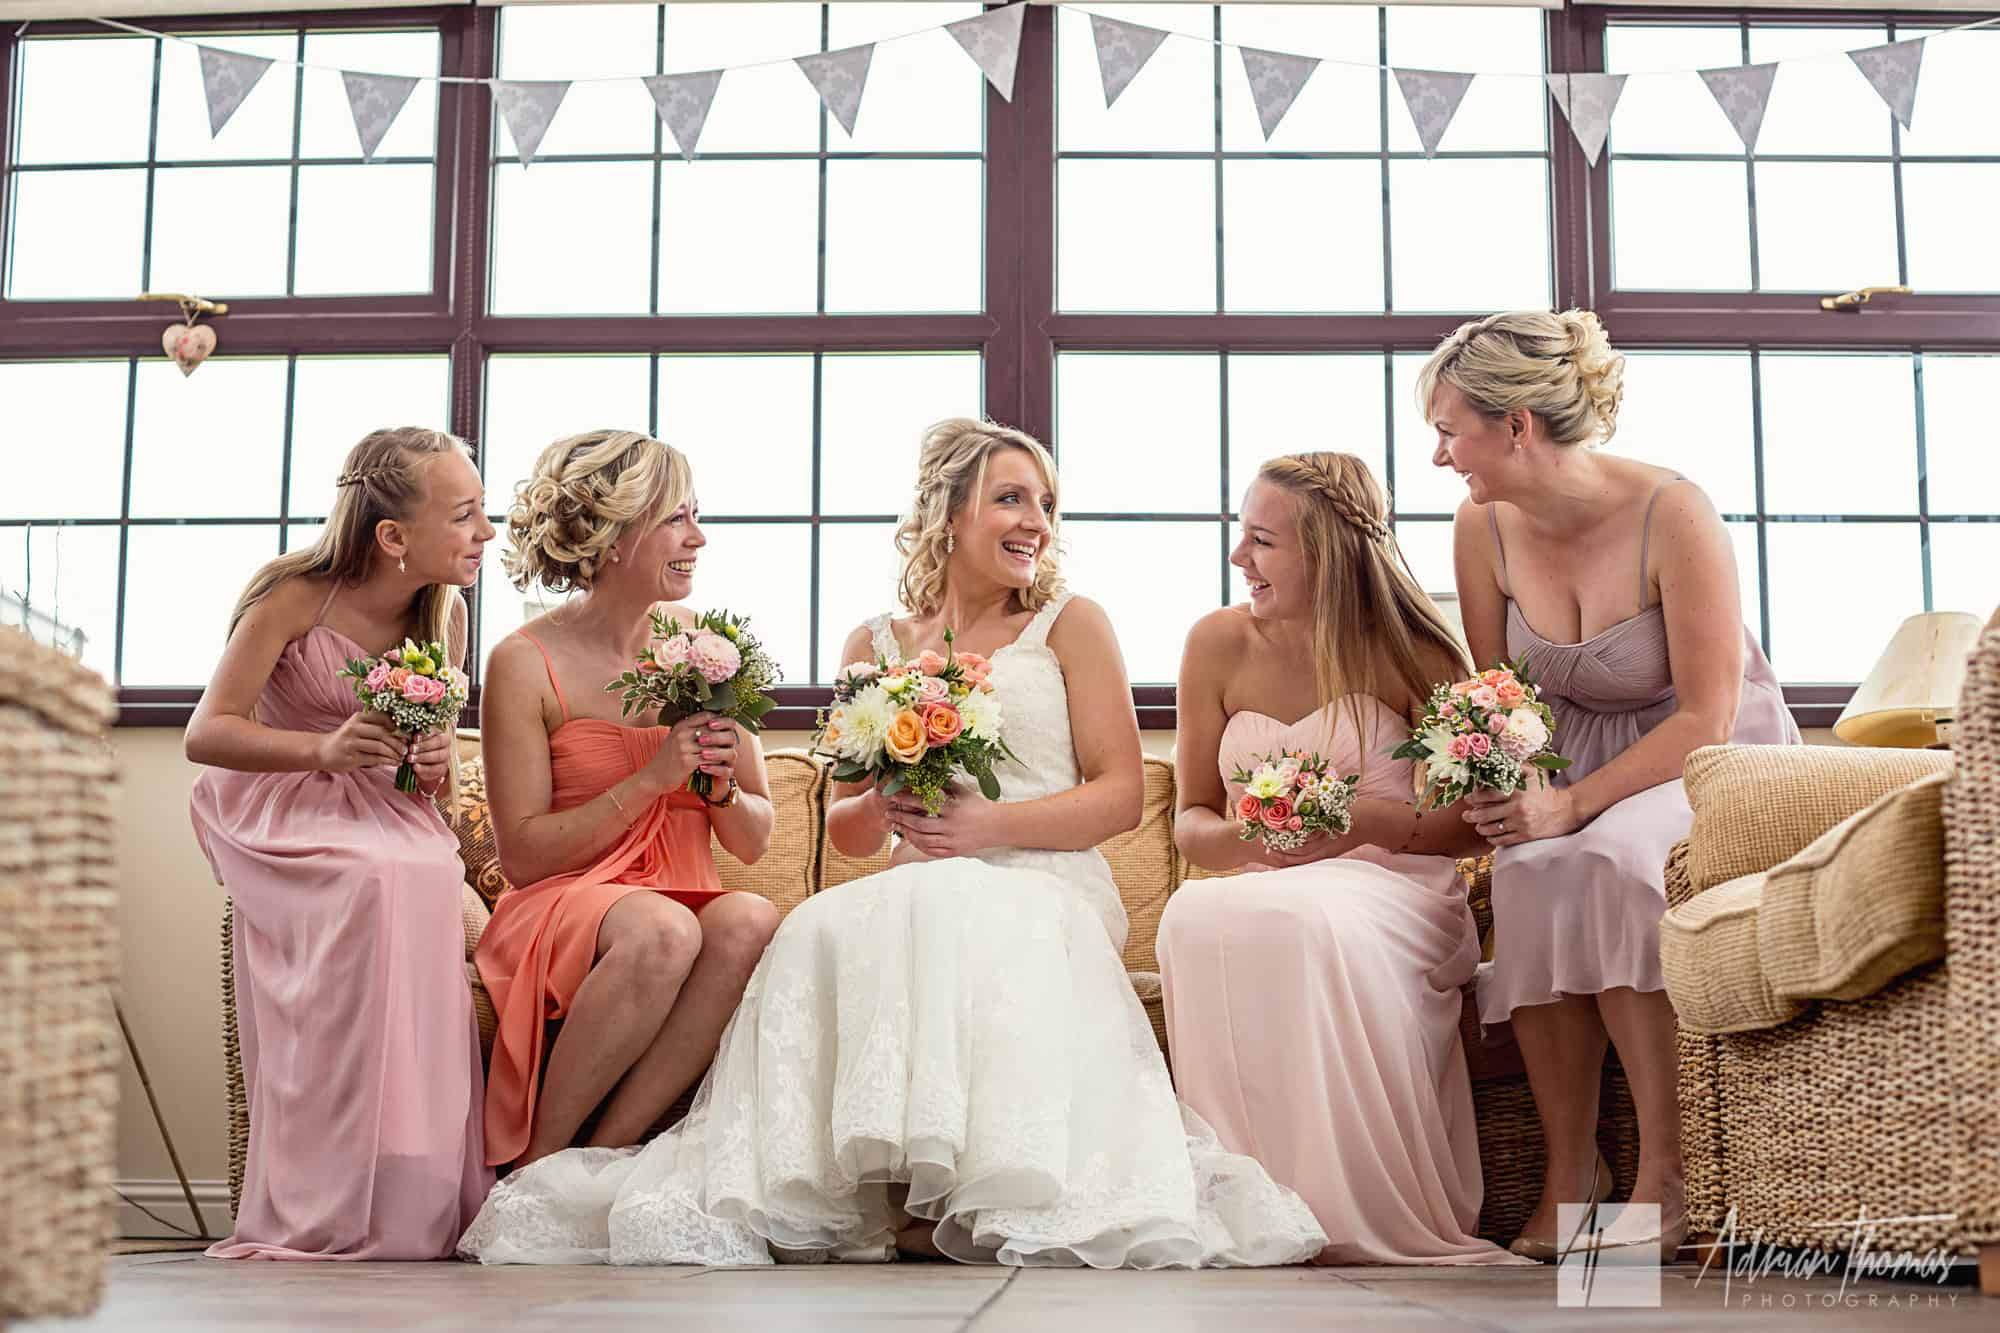 Bride and Bridesmaids chatting before wedding at Pentre Tai Farm in Bassaleg.